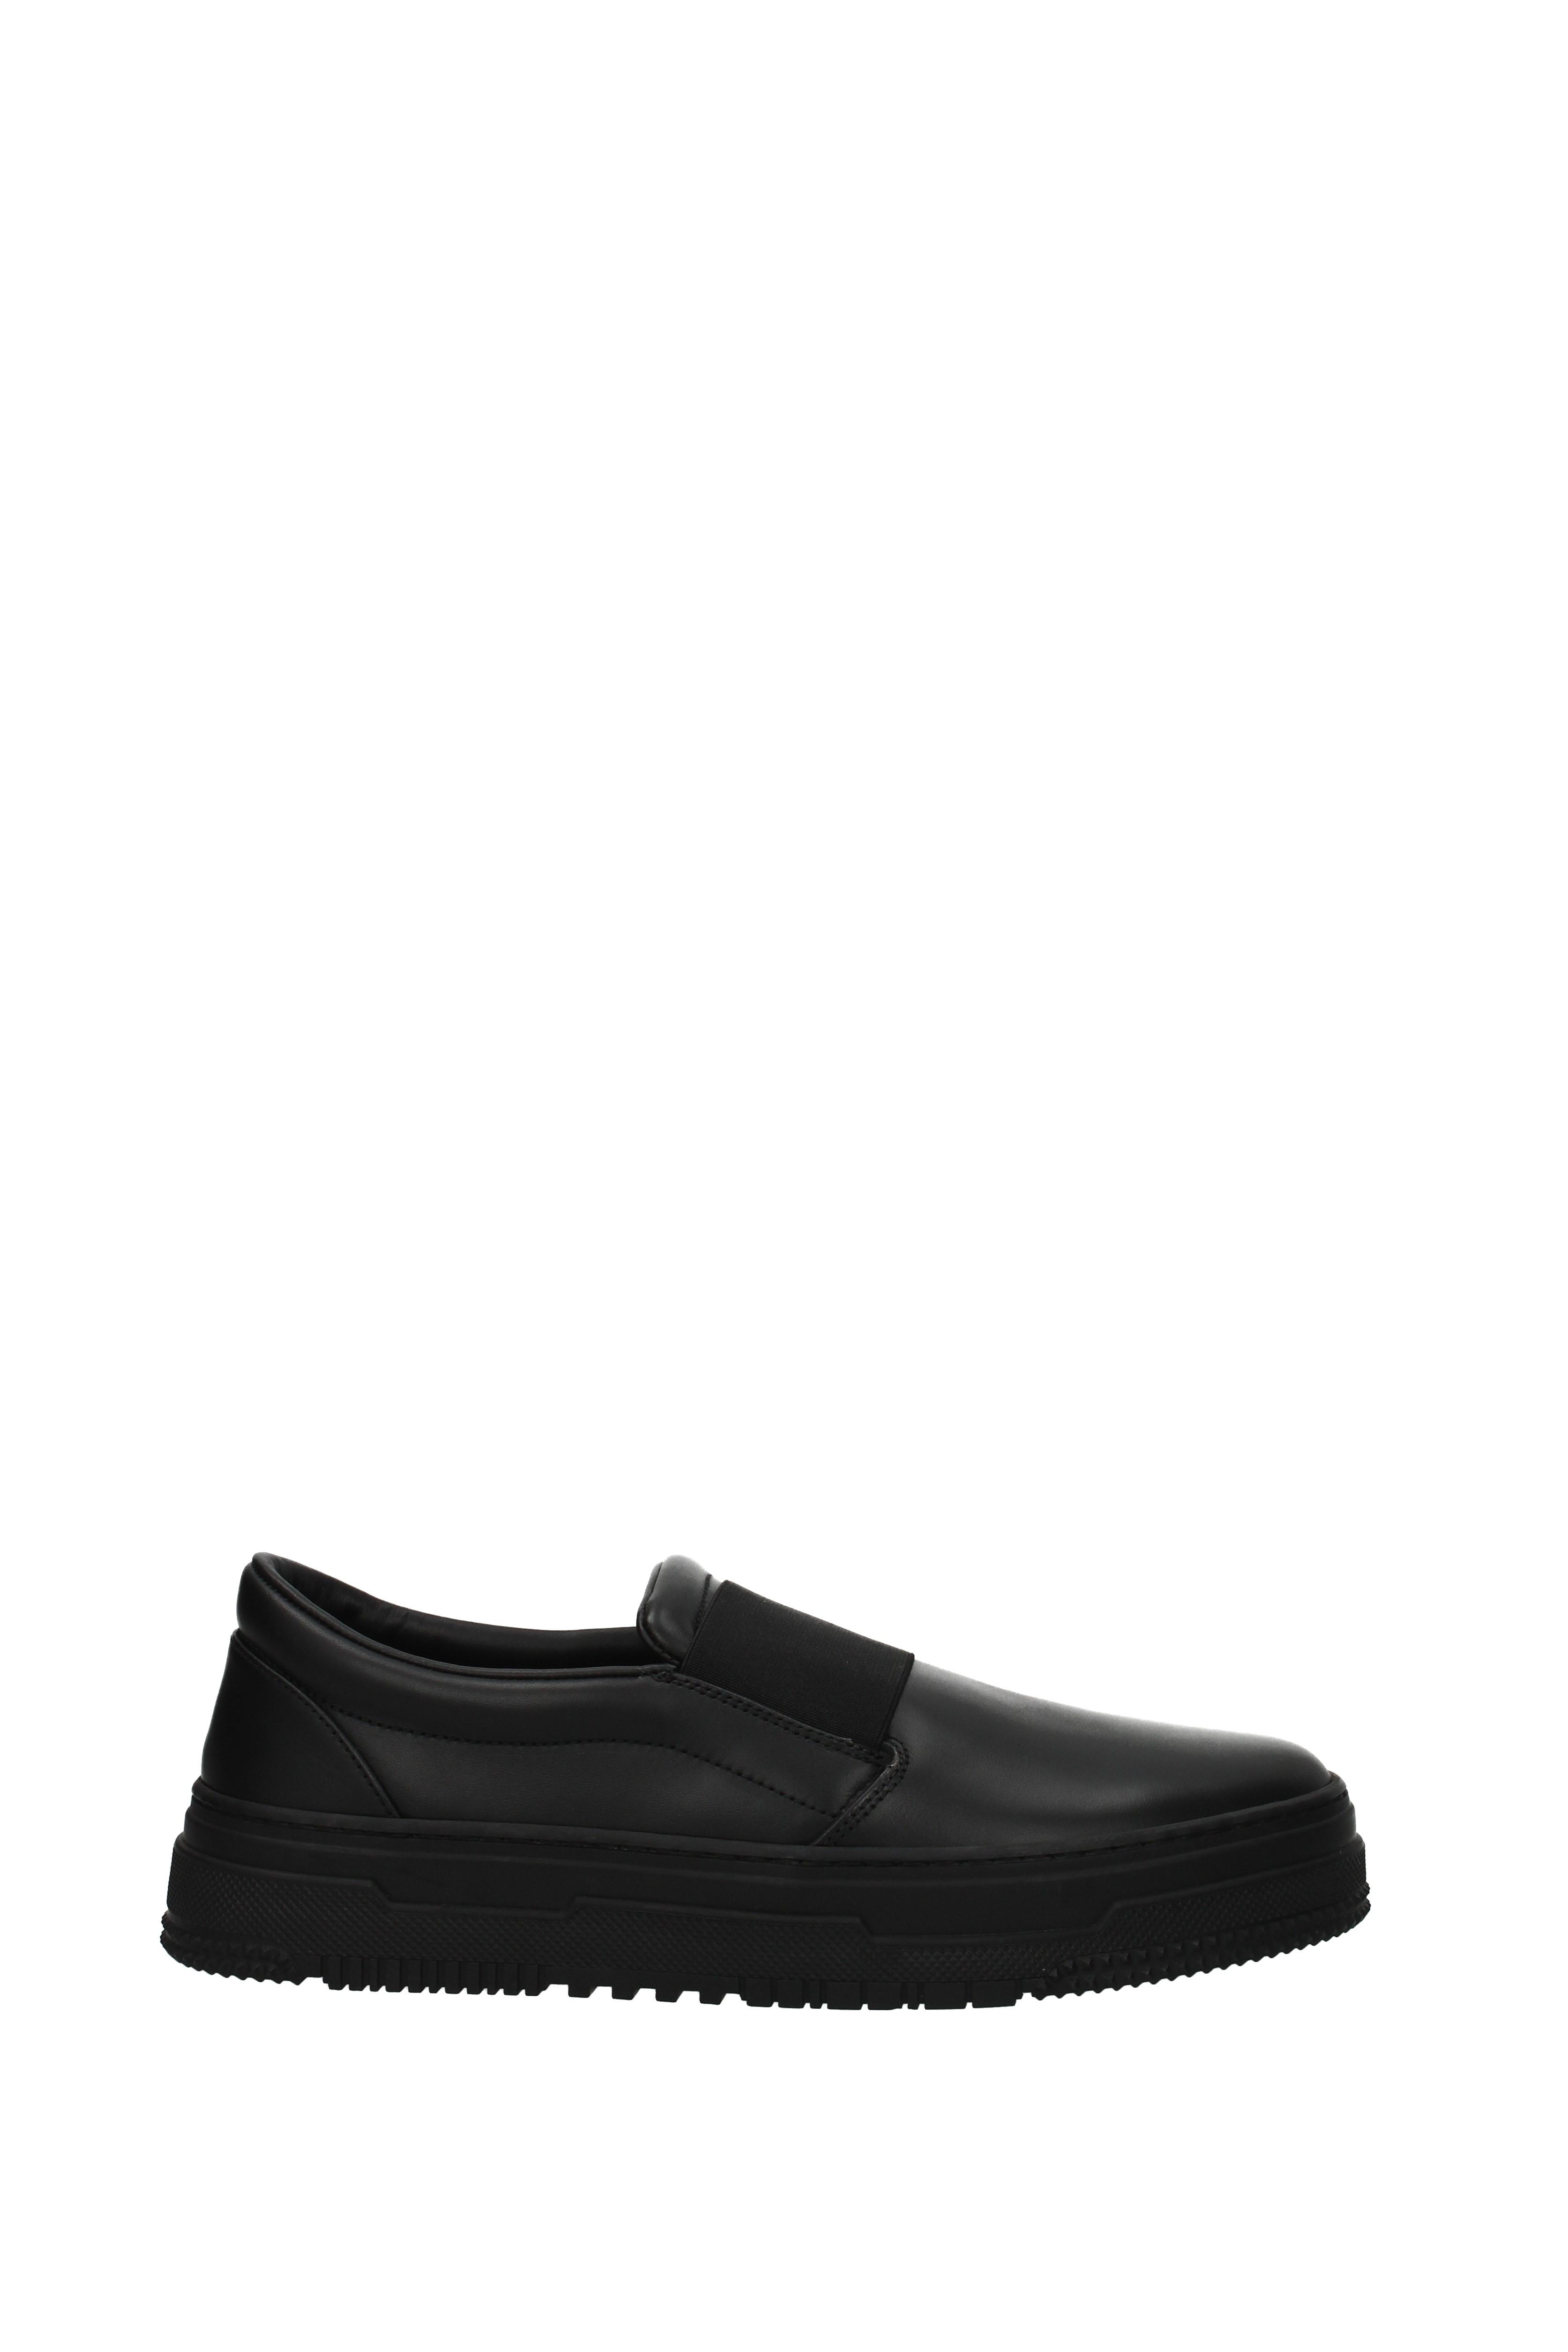 Scarpe casual da uomo  Slip On Valentino Garavani uomo - Leather (2S0929BLF)